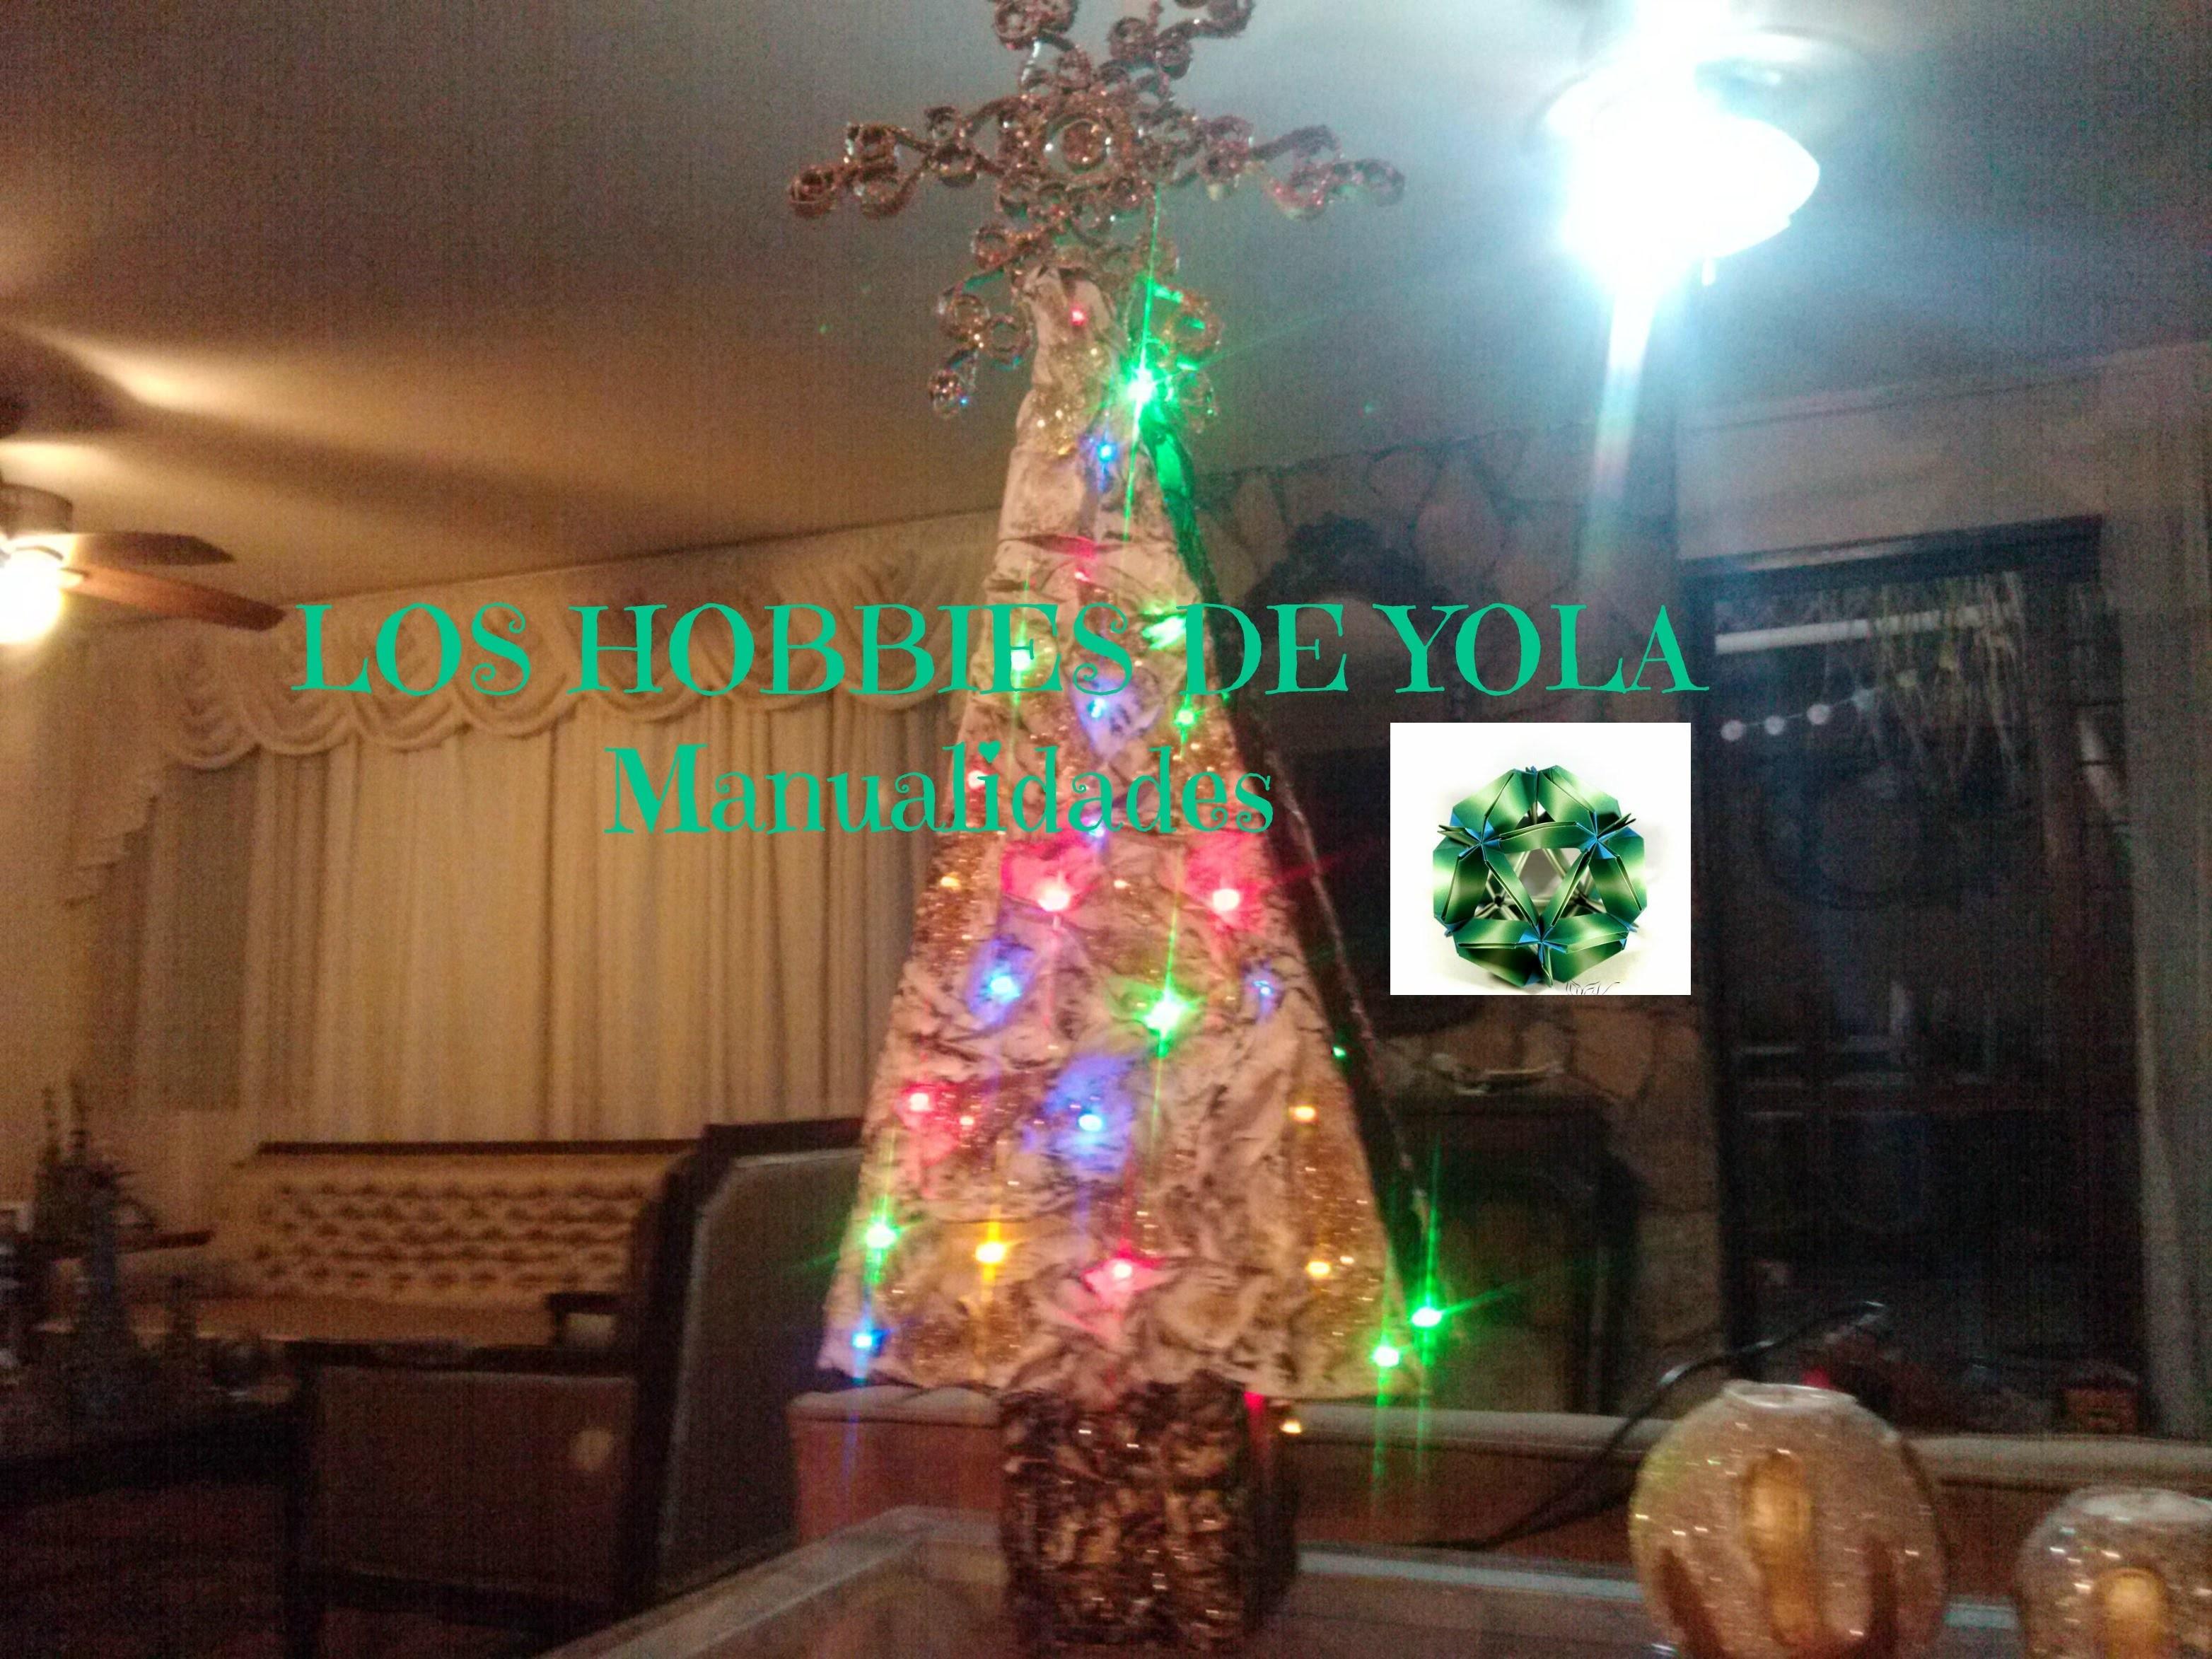 Pinito navideño iluminado de periódico y cartón. Lighted  Christmas tree